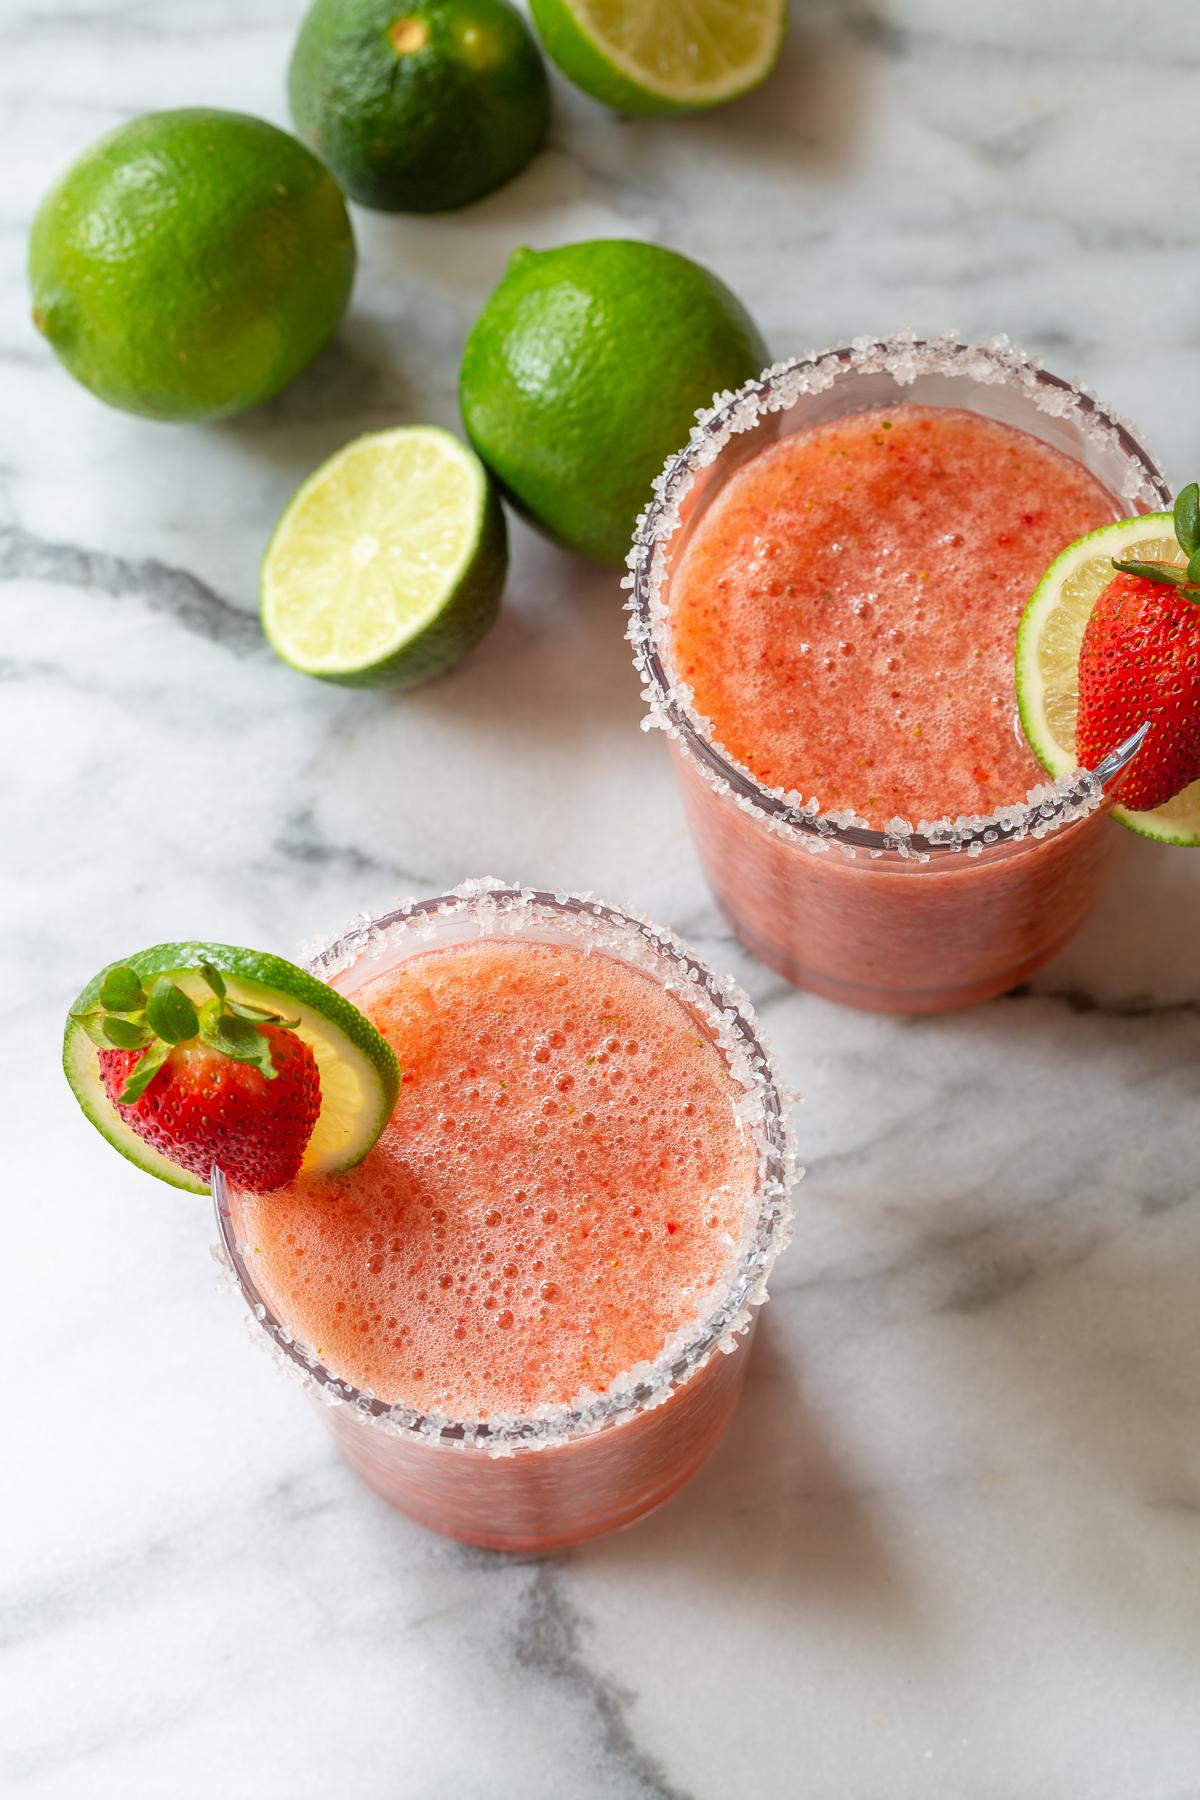 Strawberry jam  in margarita mix